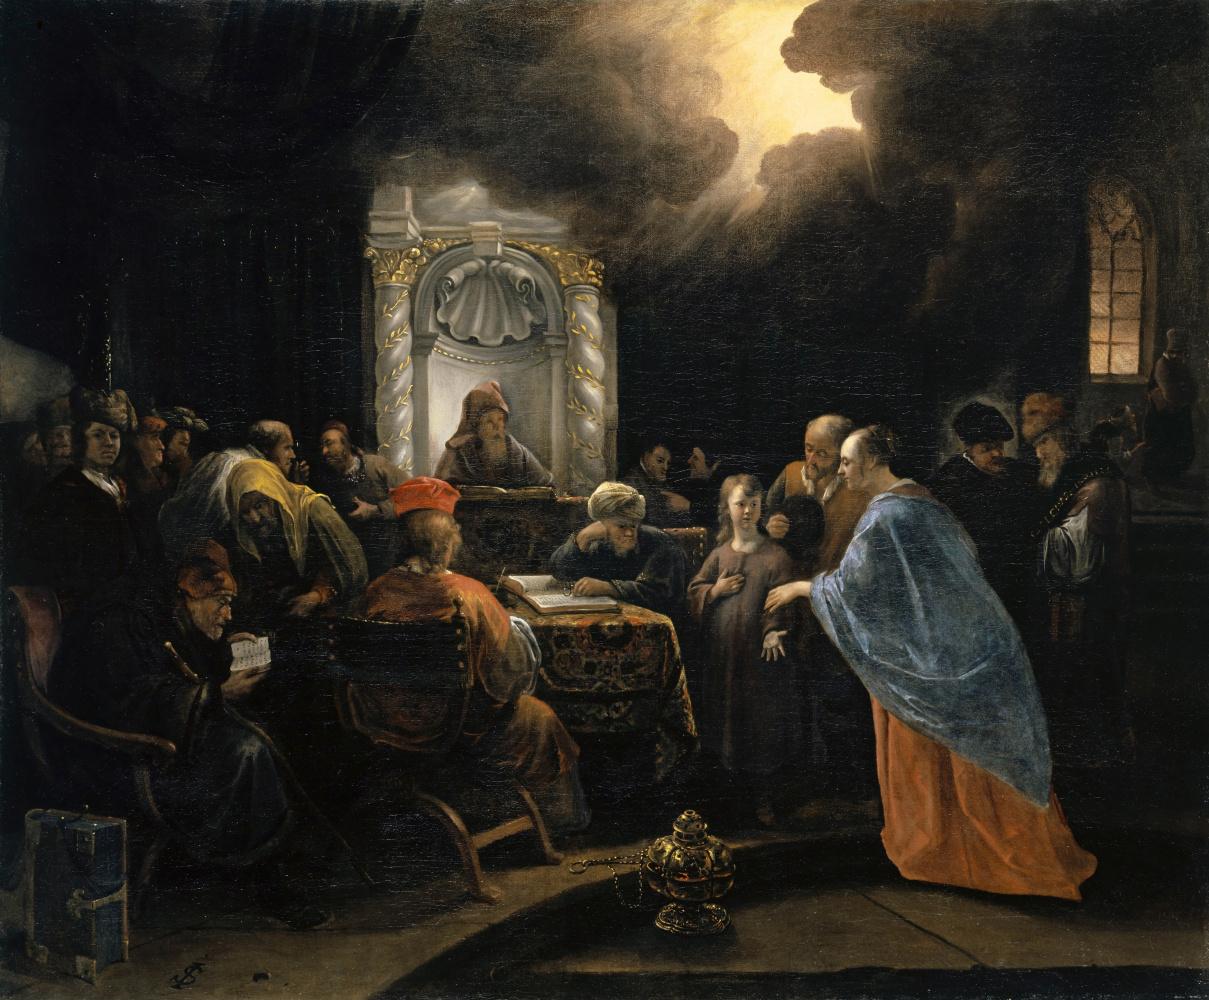 Jan Steen. Christ among the doctors